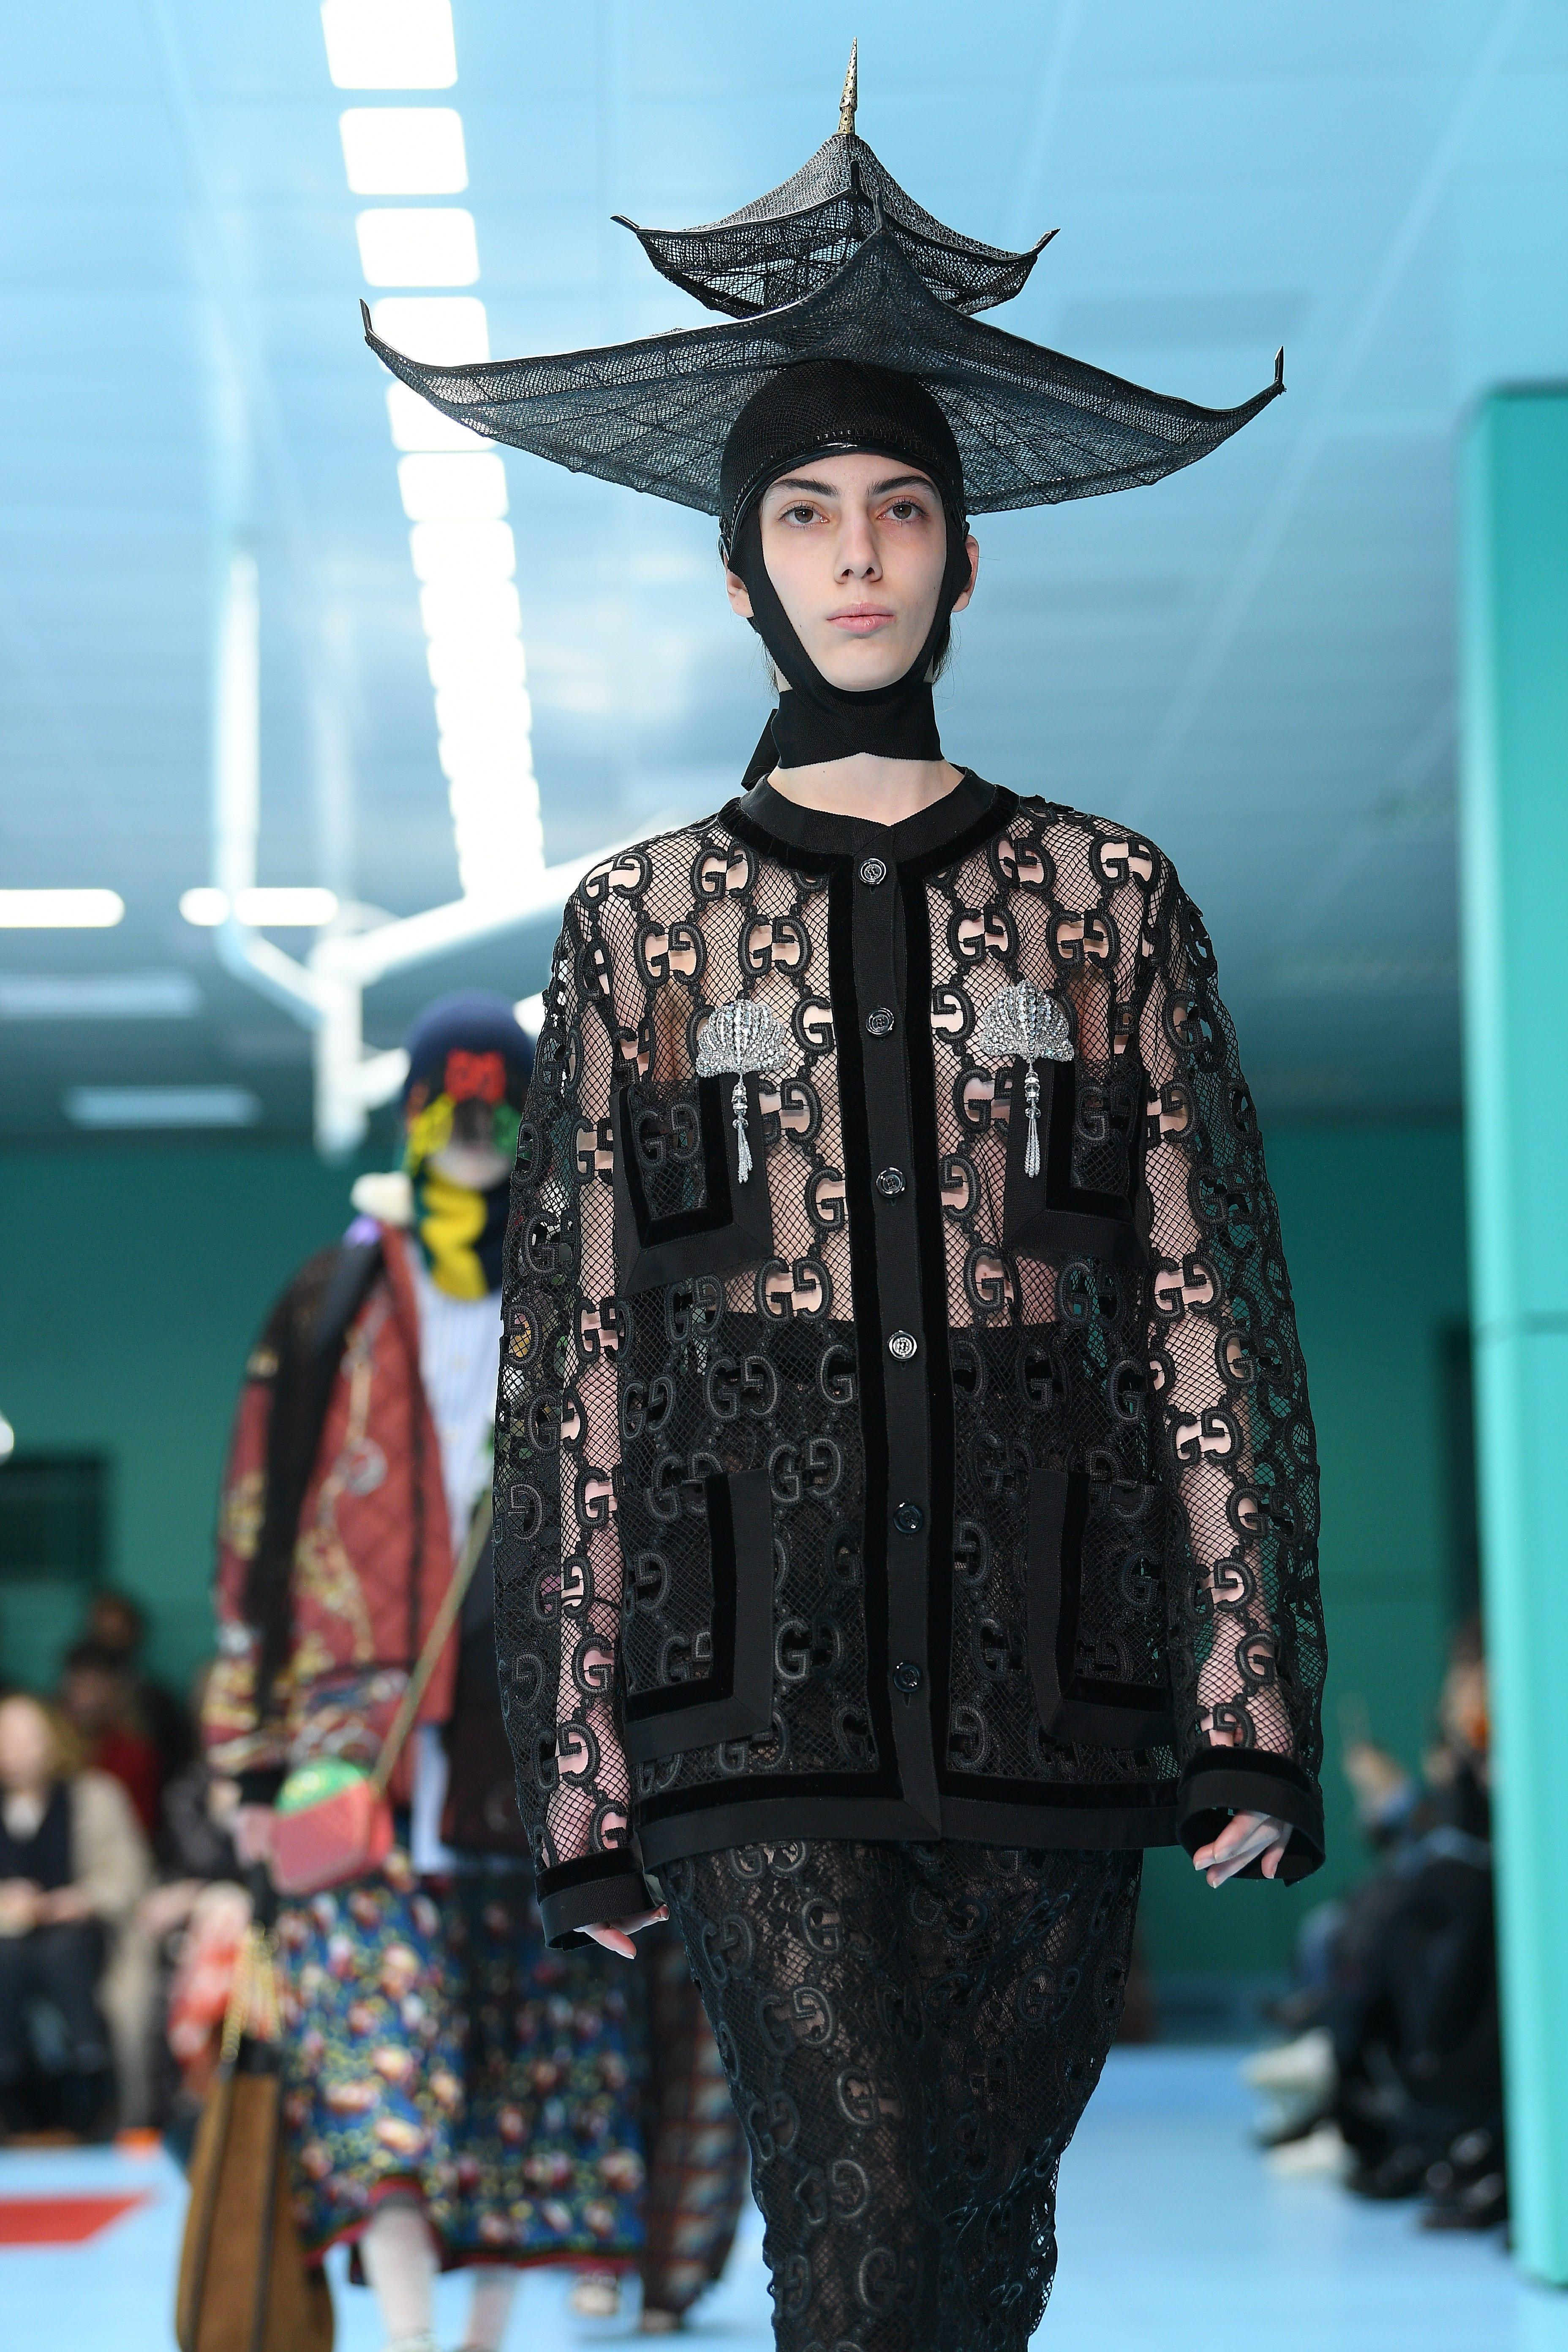 db5304adb280 Gucci Fall 2018 Show Proves Fashion Is Fun   Weird